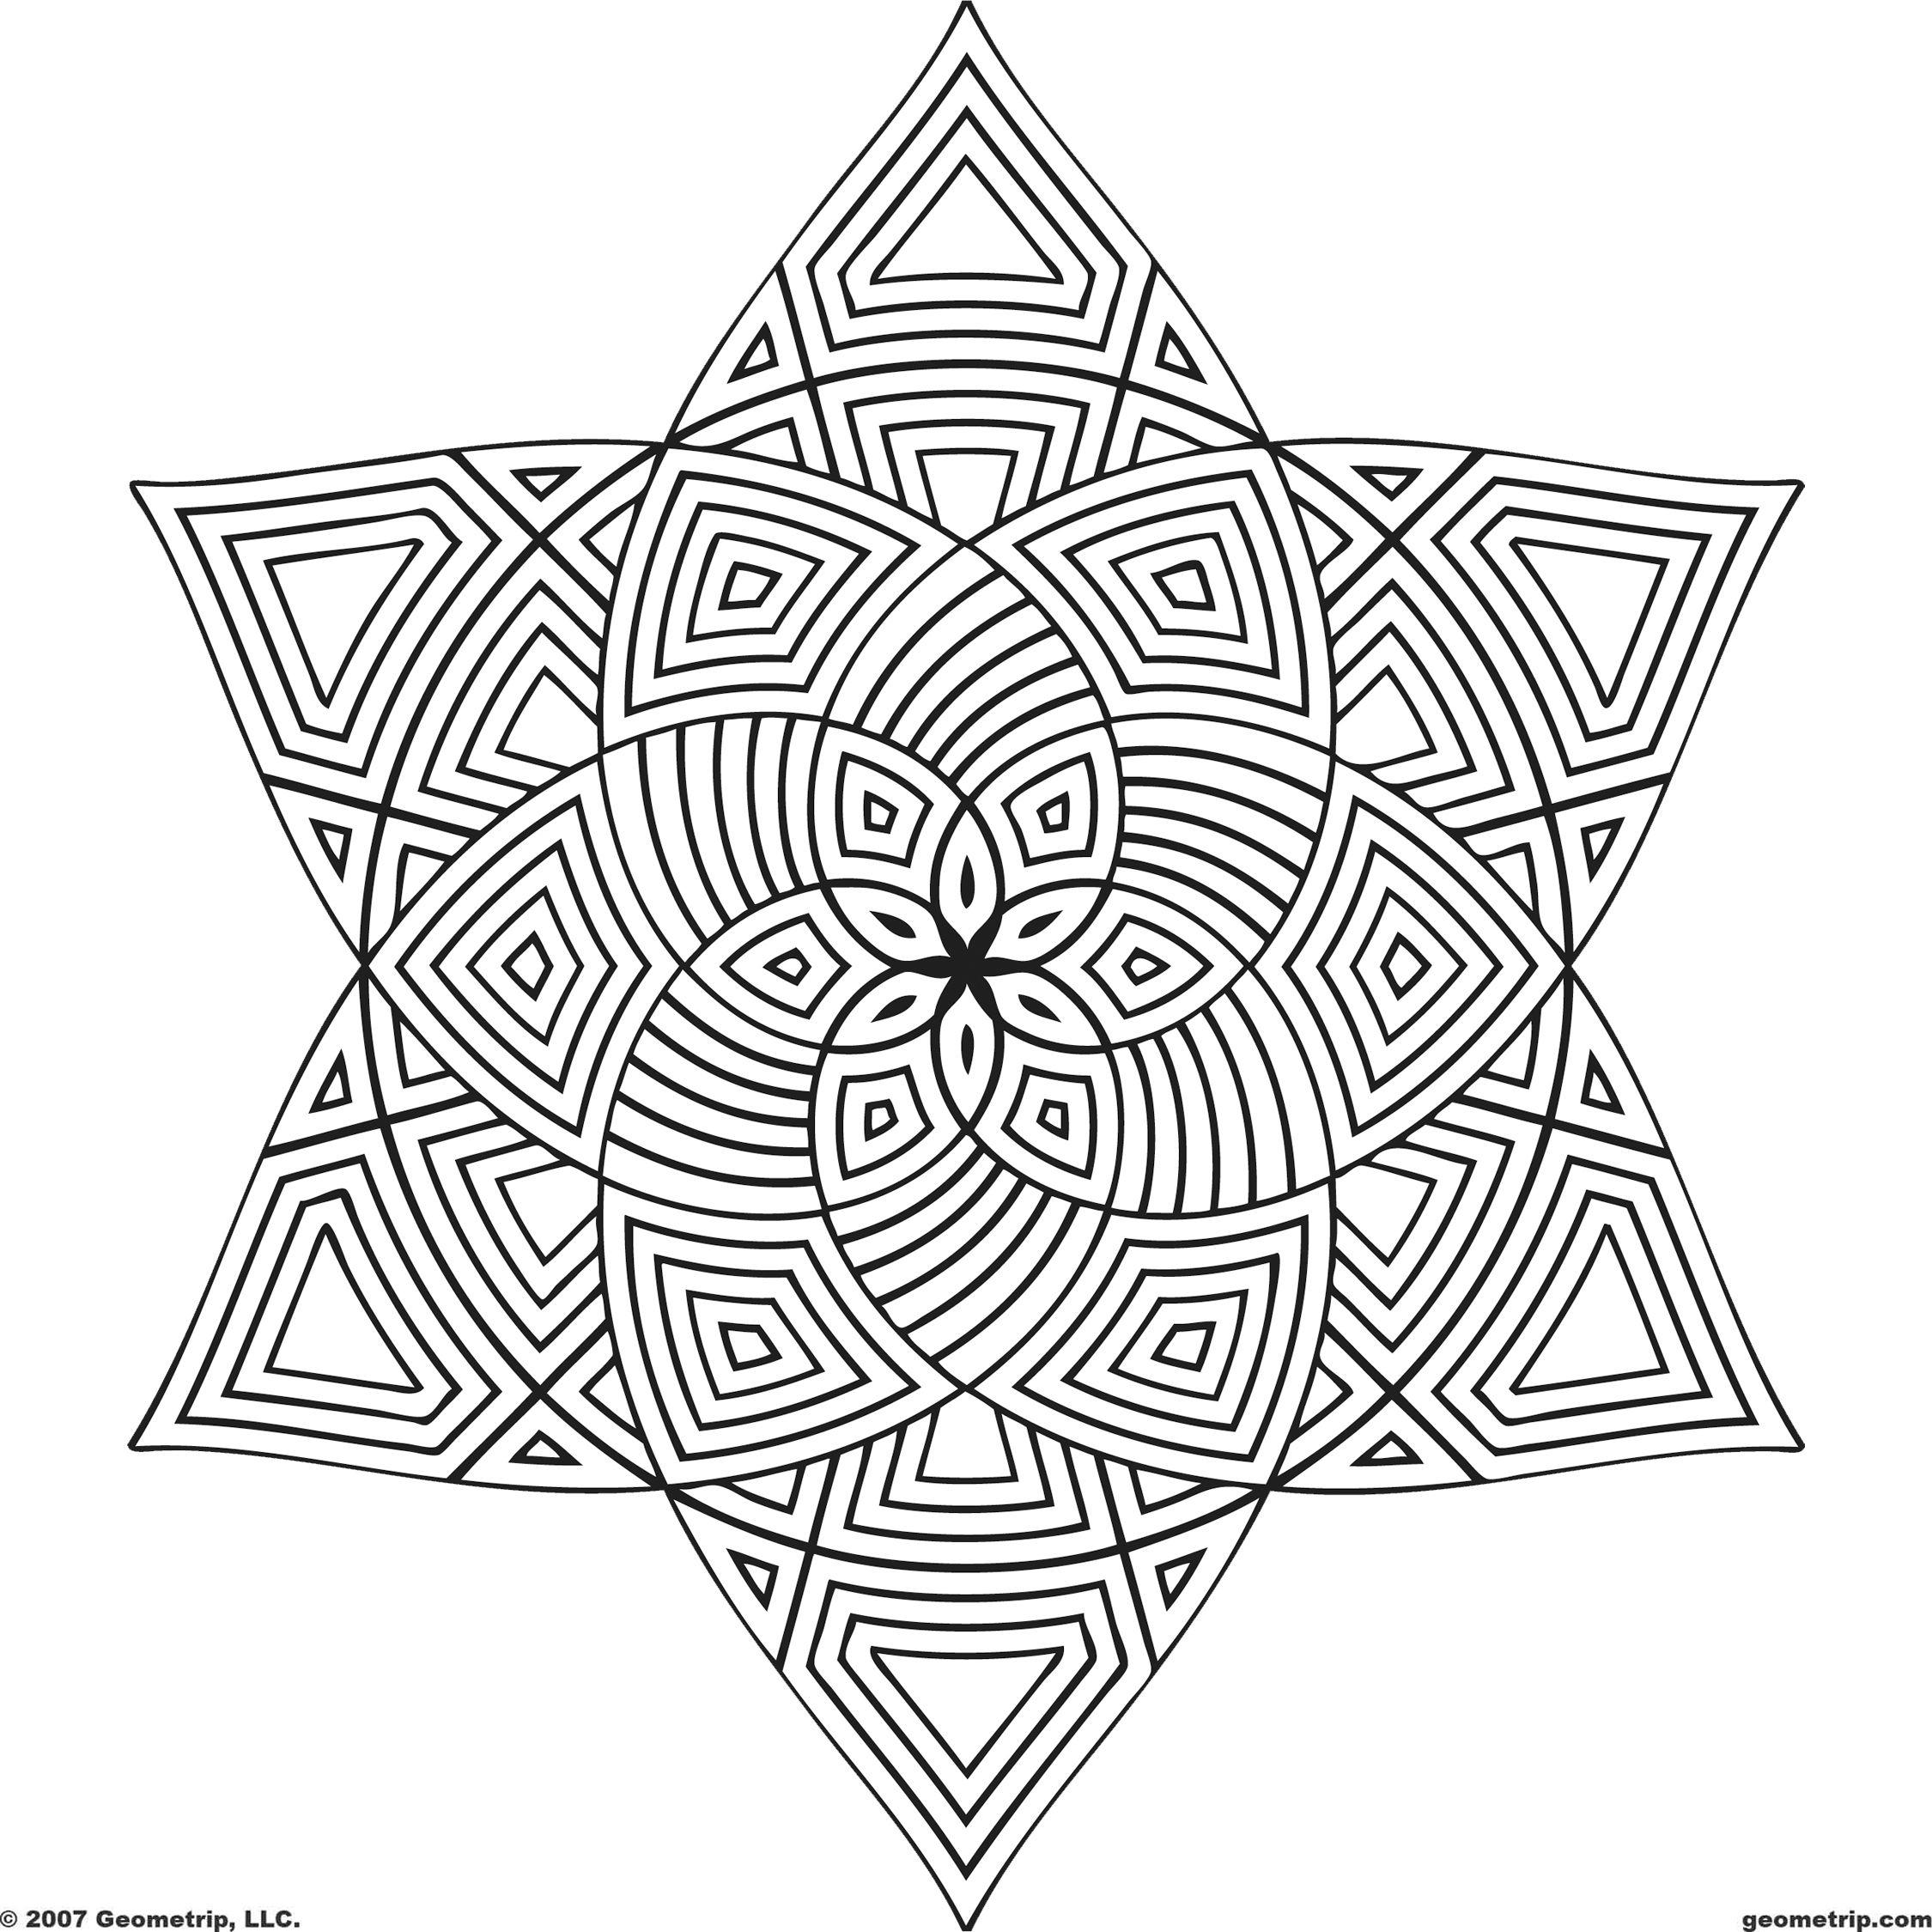 Free Printable Mandala Coloring Pages   Shapes: Page 1 Of 2 - Free Printable Mandala Coloring Pages